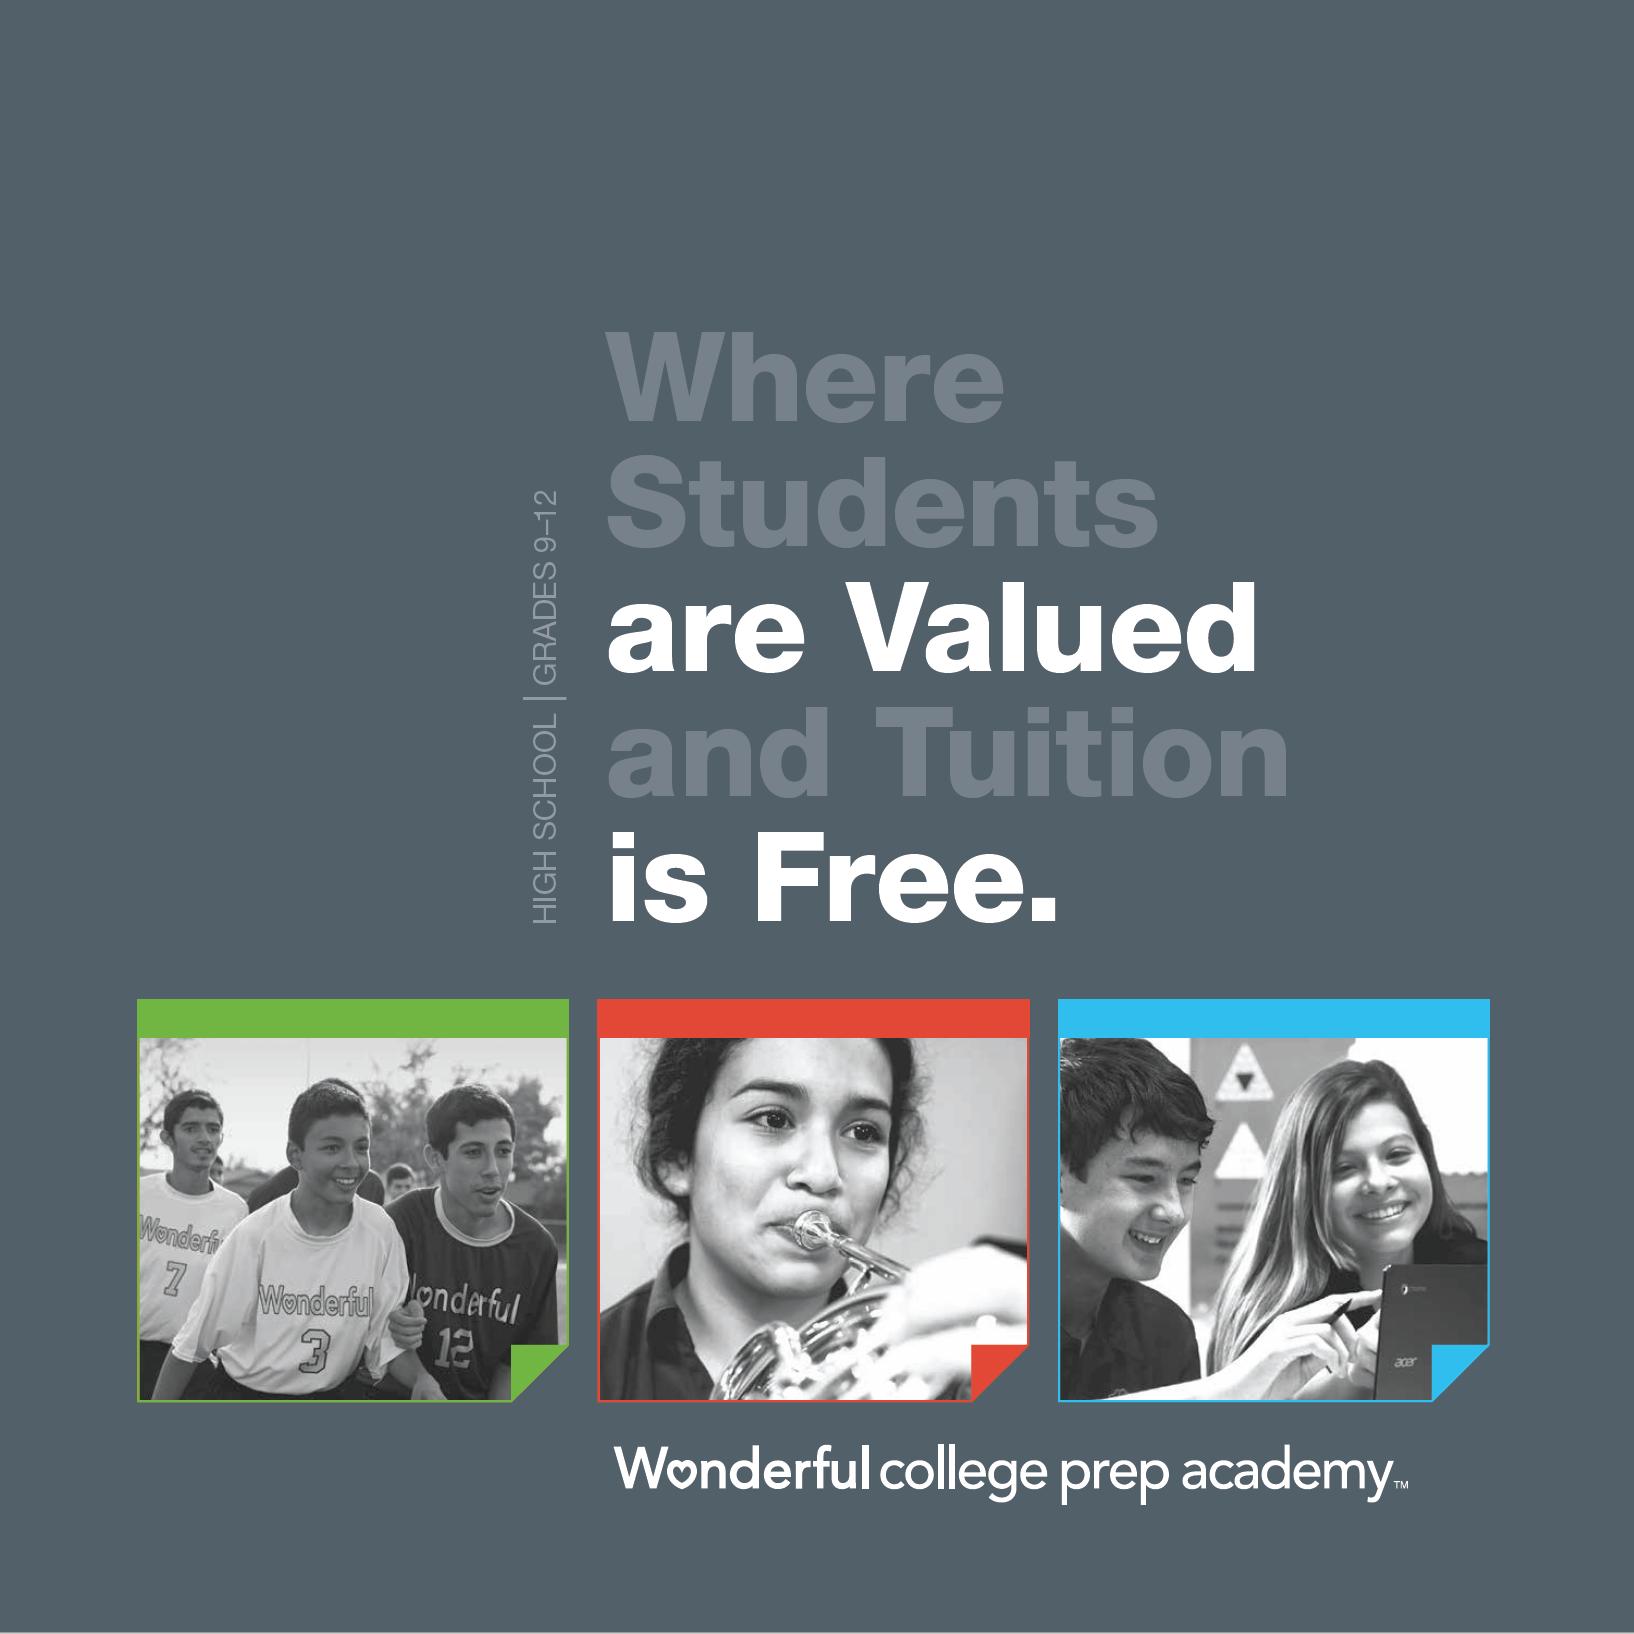 Wonderful College Prep Academy 9th-12th Grade